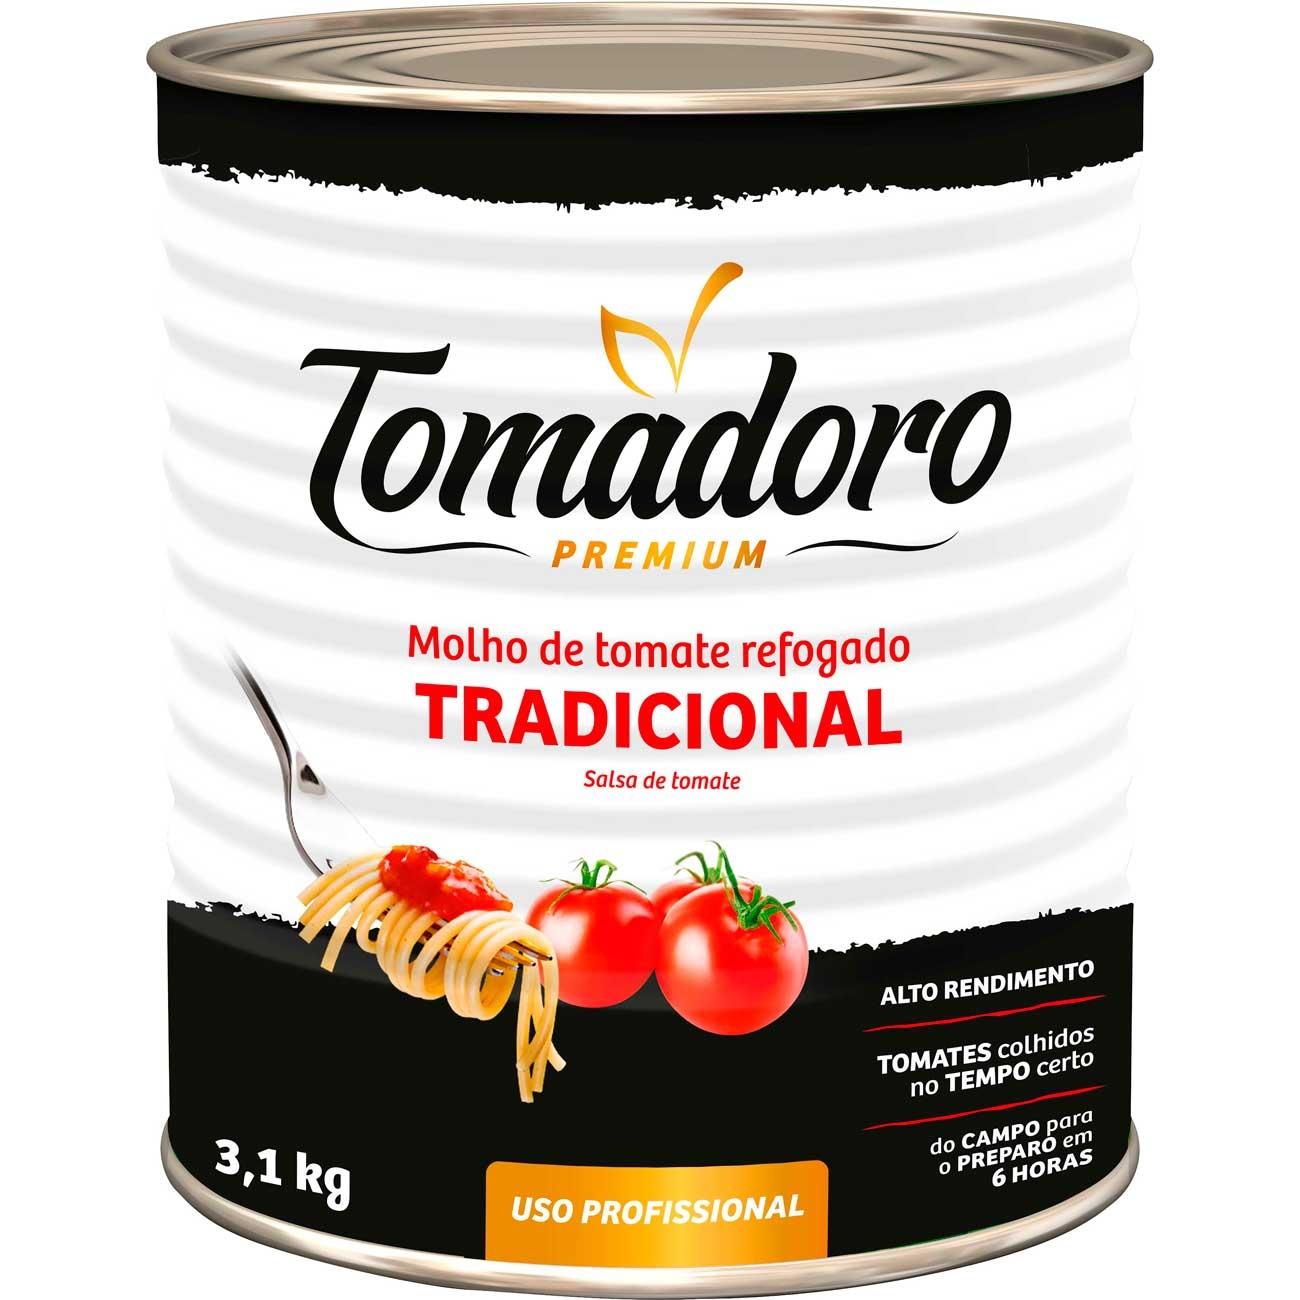 Molho De Tomate Tomadoro Premium Tradicional Lata 3.1kg